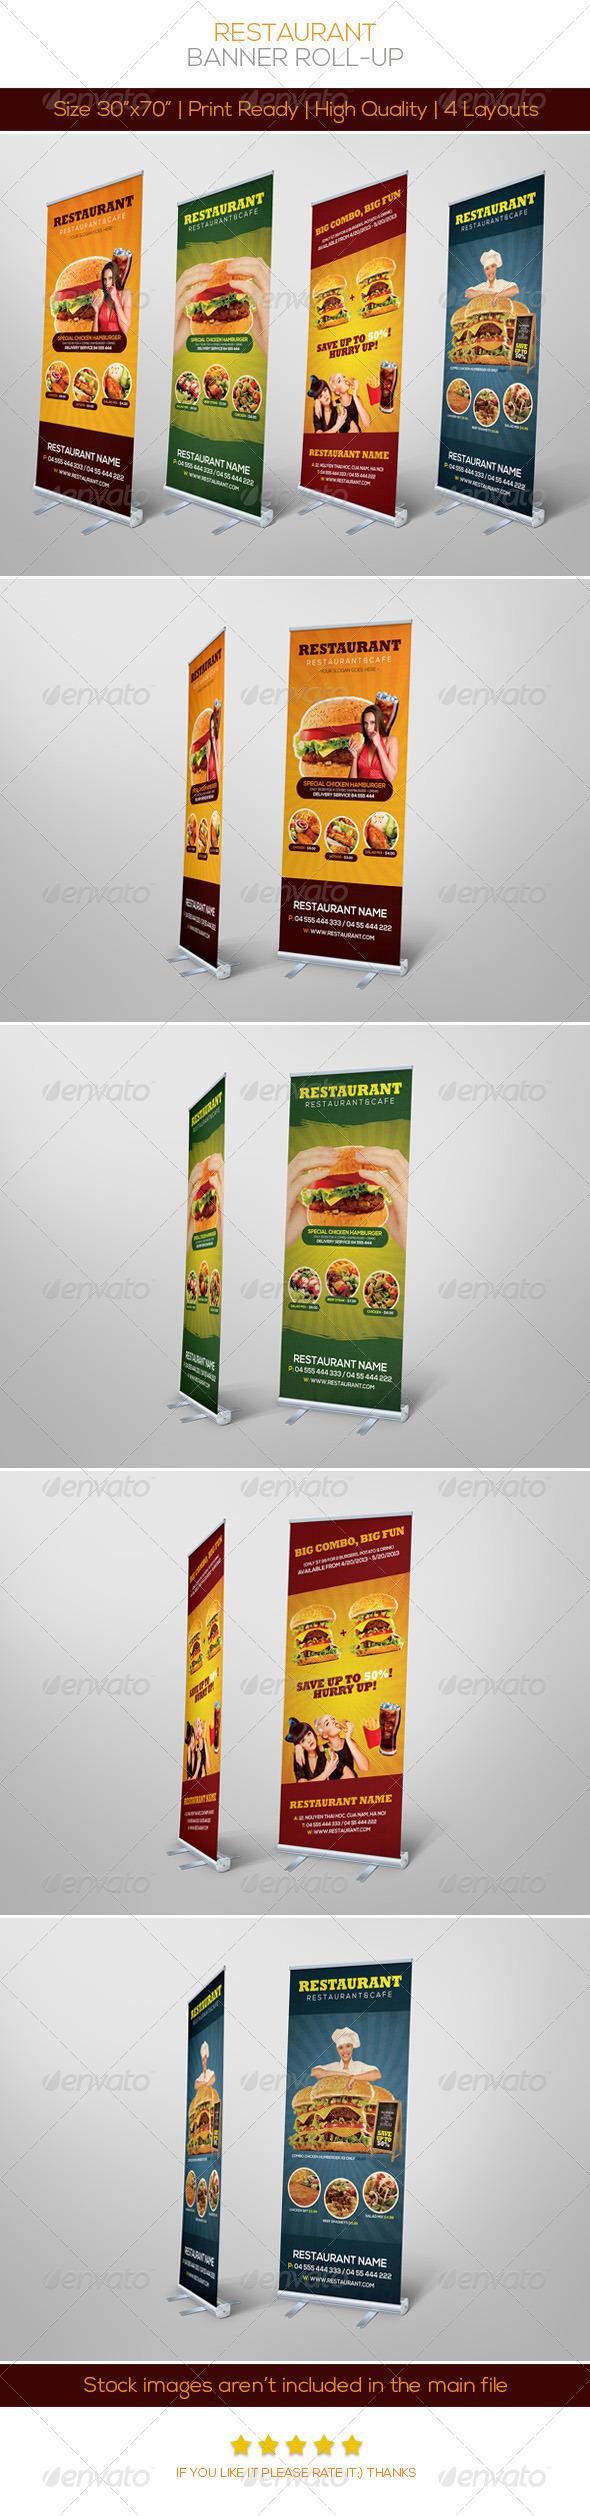 Premium Restaurant Banner Roll-up - Signage Print Templates